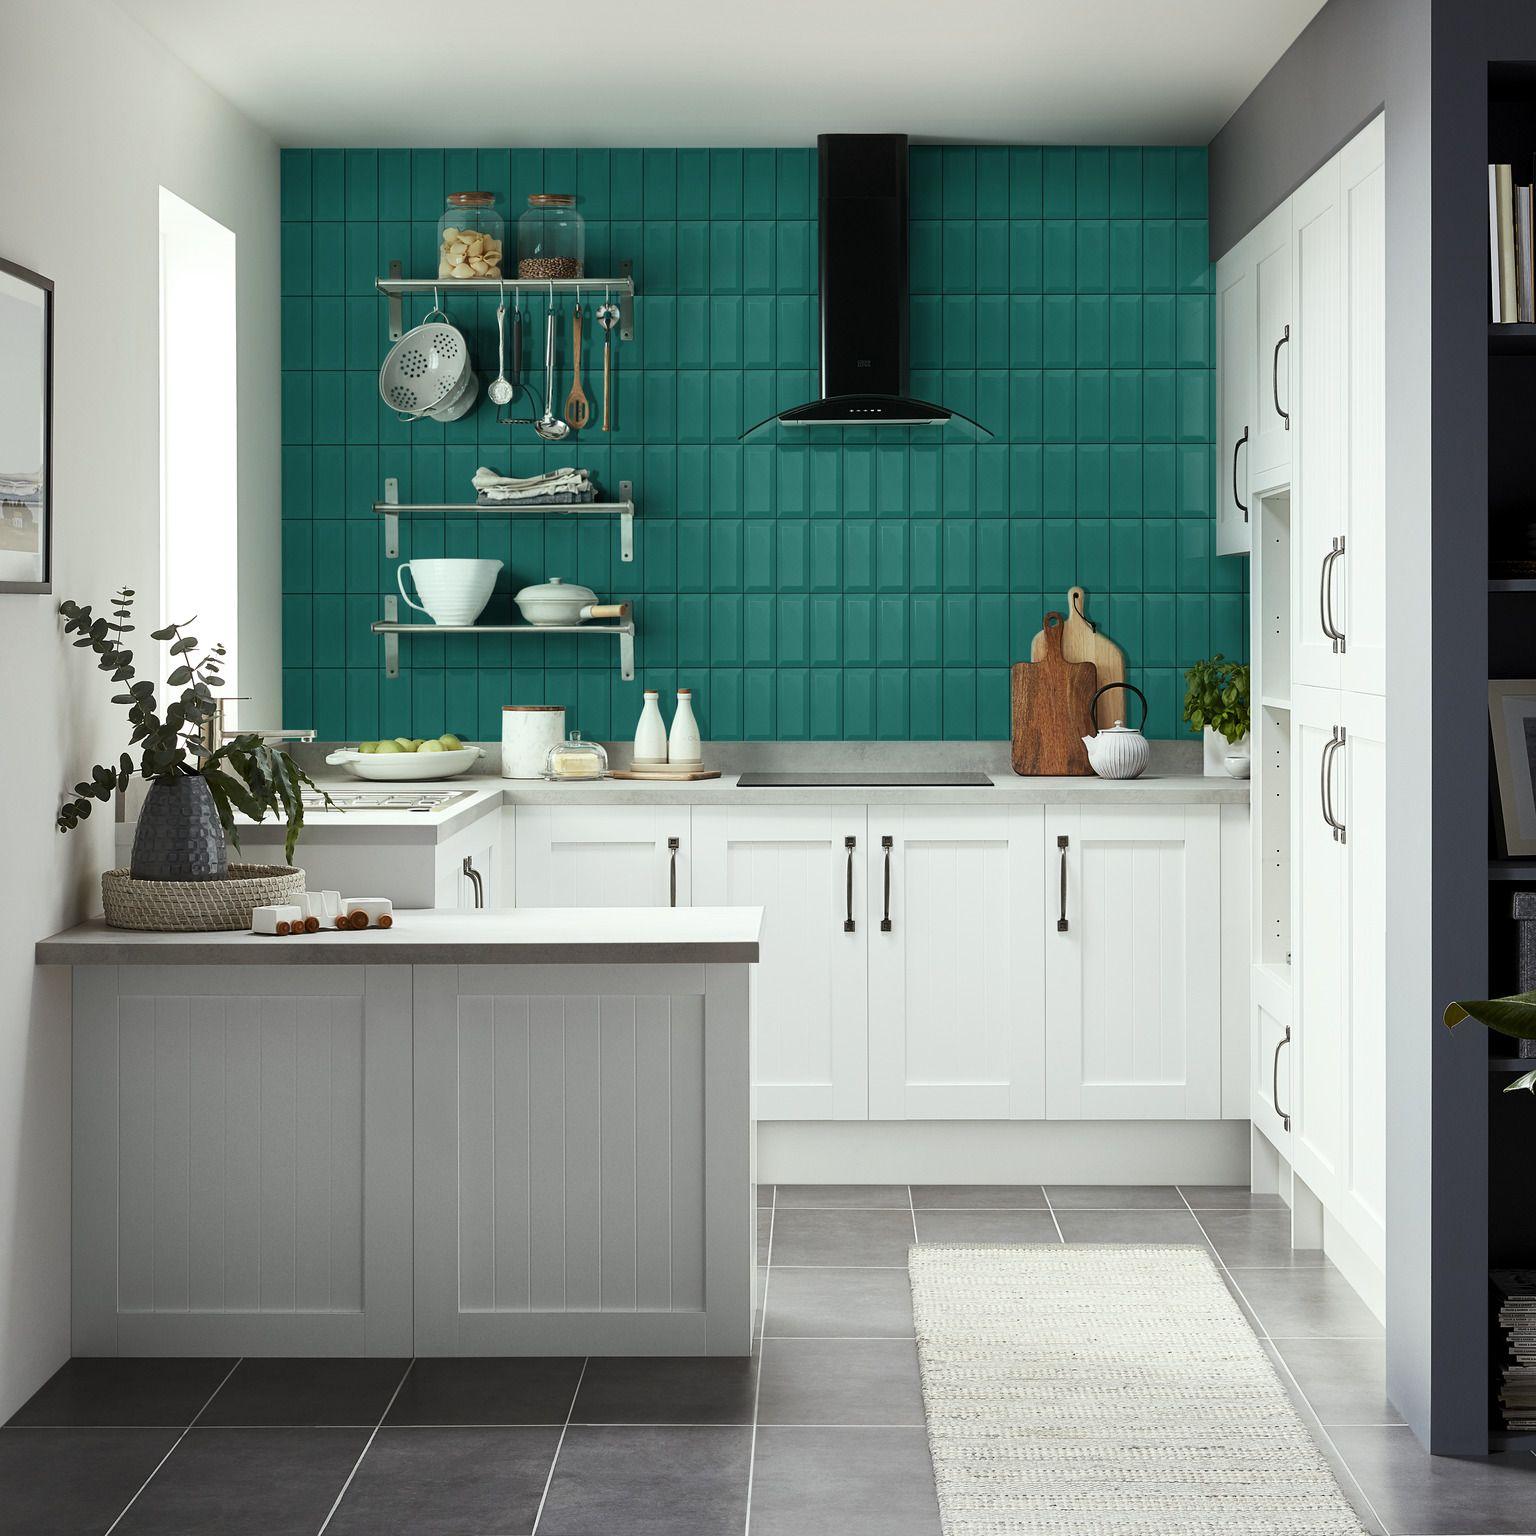 Glazura Trentie Goodhome 10 X 20 Cm Dark Green 0 8 M2 Ceramic Wall Tiles Wall Tiles Diy Grout